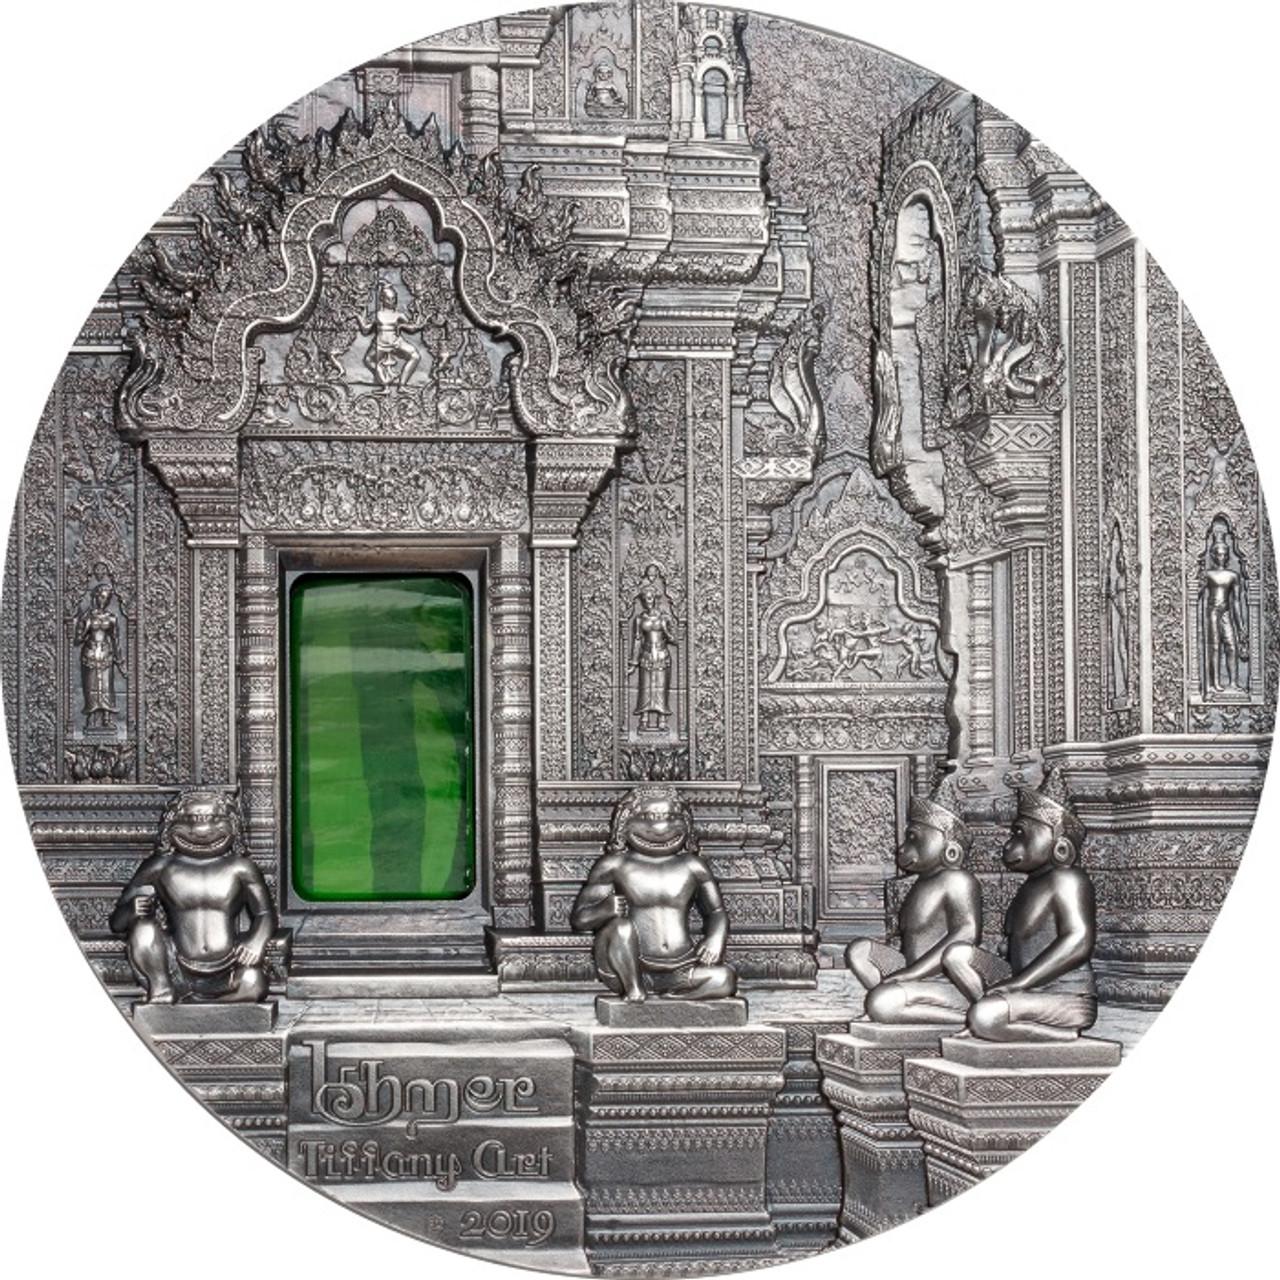 TIFFANY ART Khmer 2 Oz Silver Coin 10$ Palau 2019